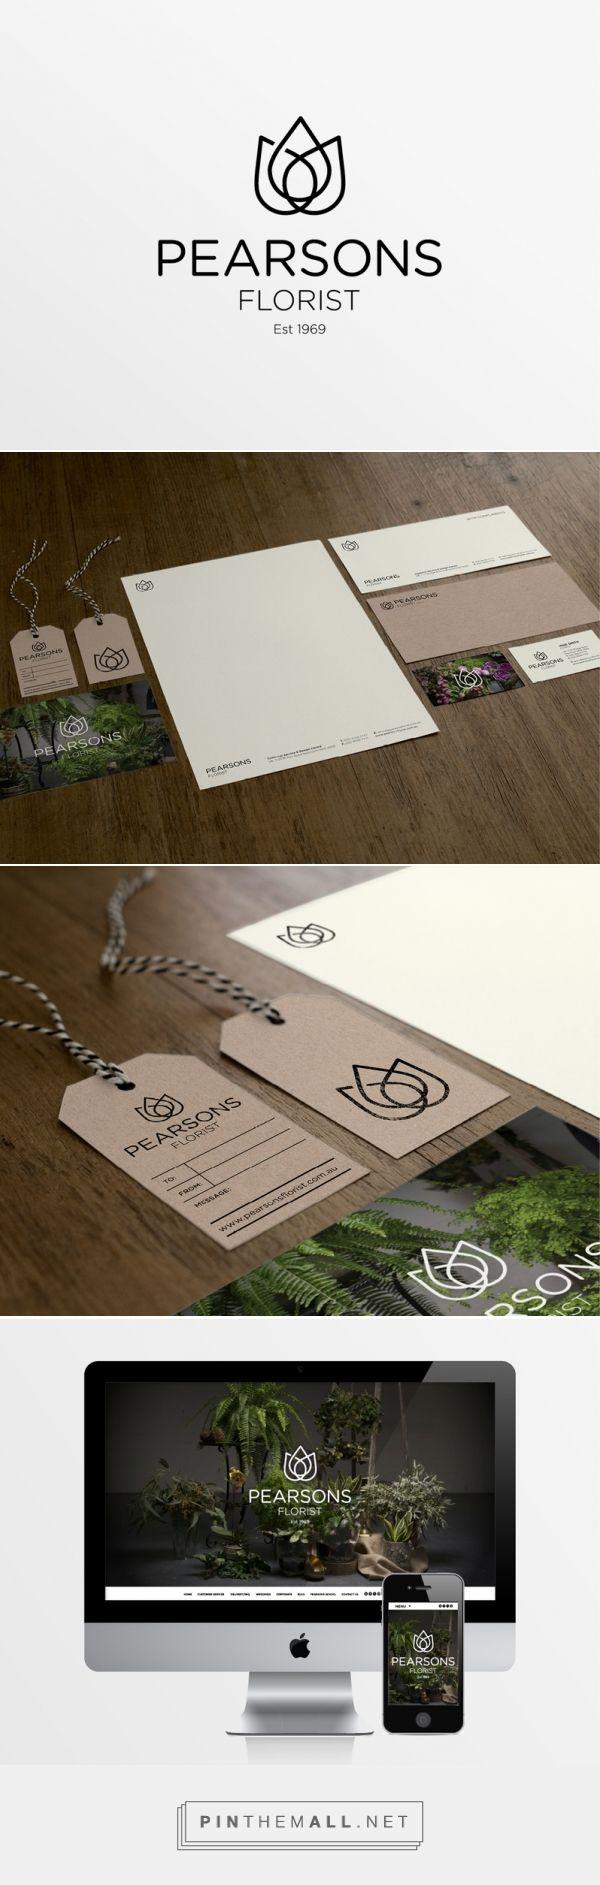 Pearsons Florist by Katherine Johnson   Fivestar Branding – Design and Branding Agency & Inspiration Gallery